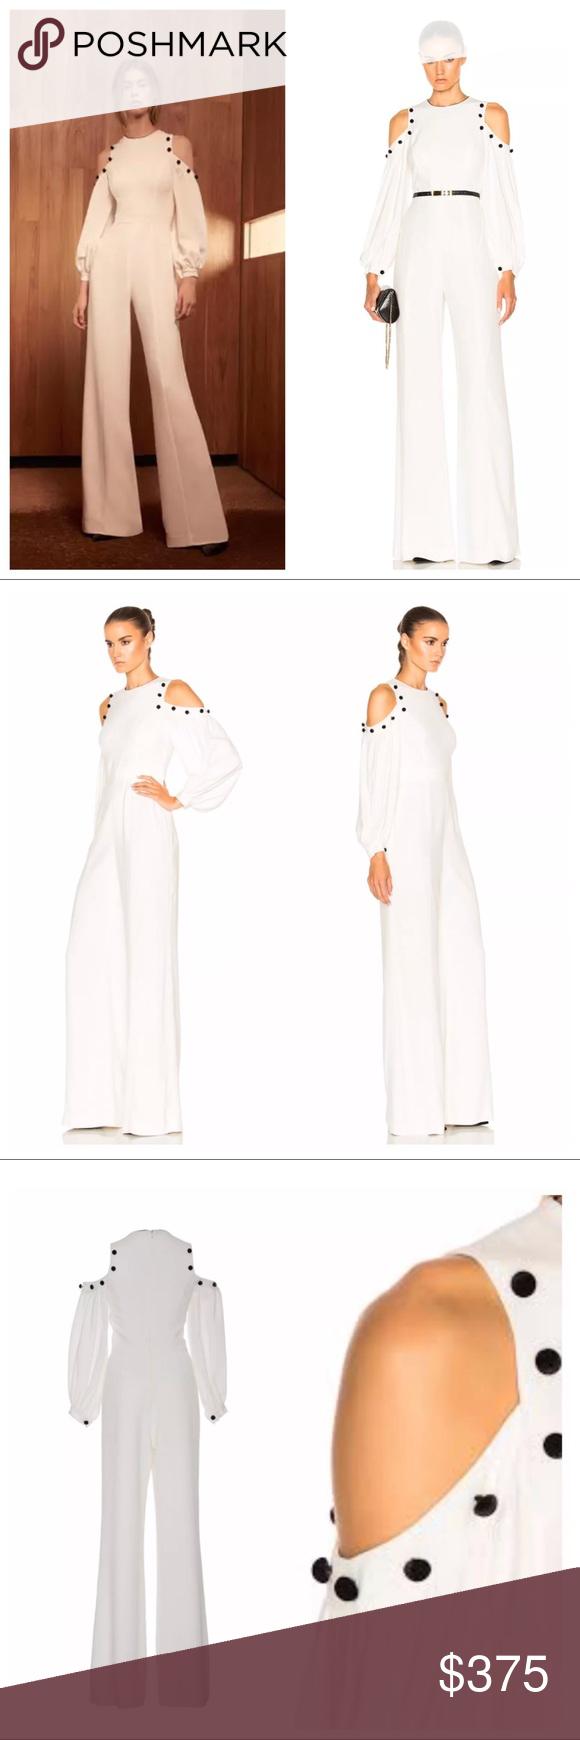 614752c3725 Alexis Easton White Jumpsuit Editor s Note This Alexis Easton Cold Shoulder  Jumpsuit features a jewel neckline